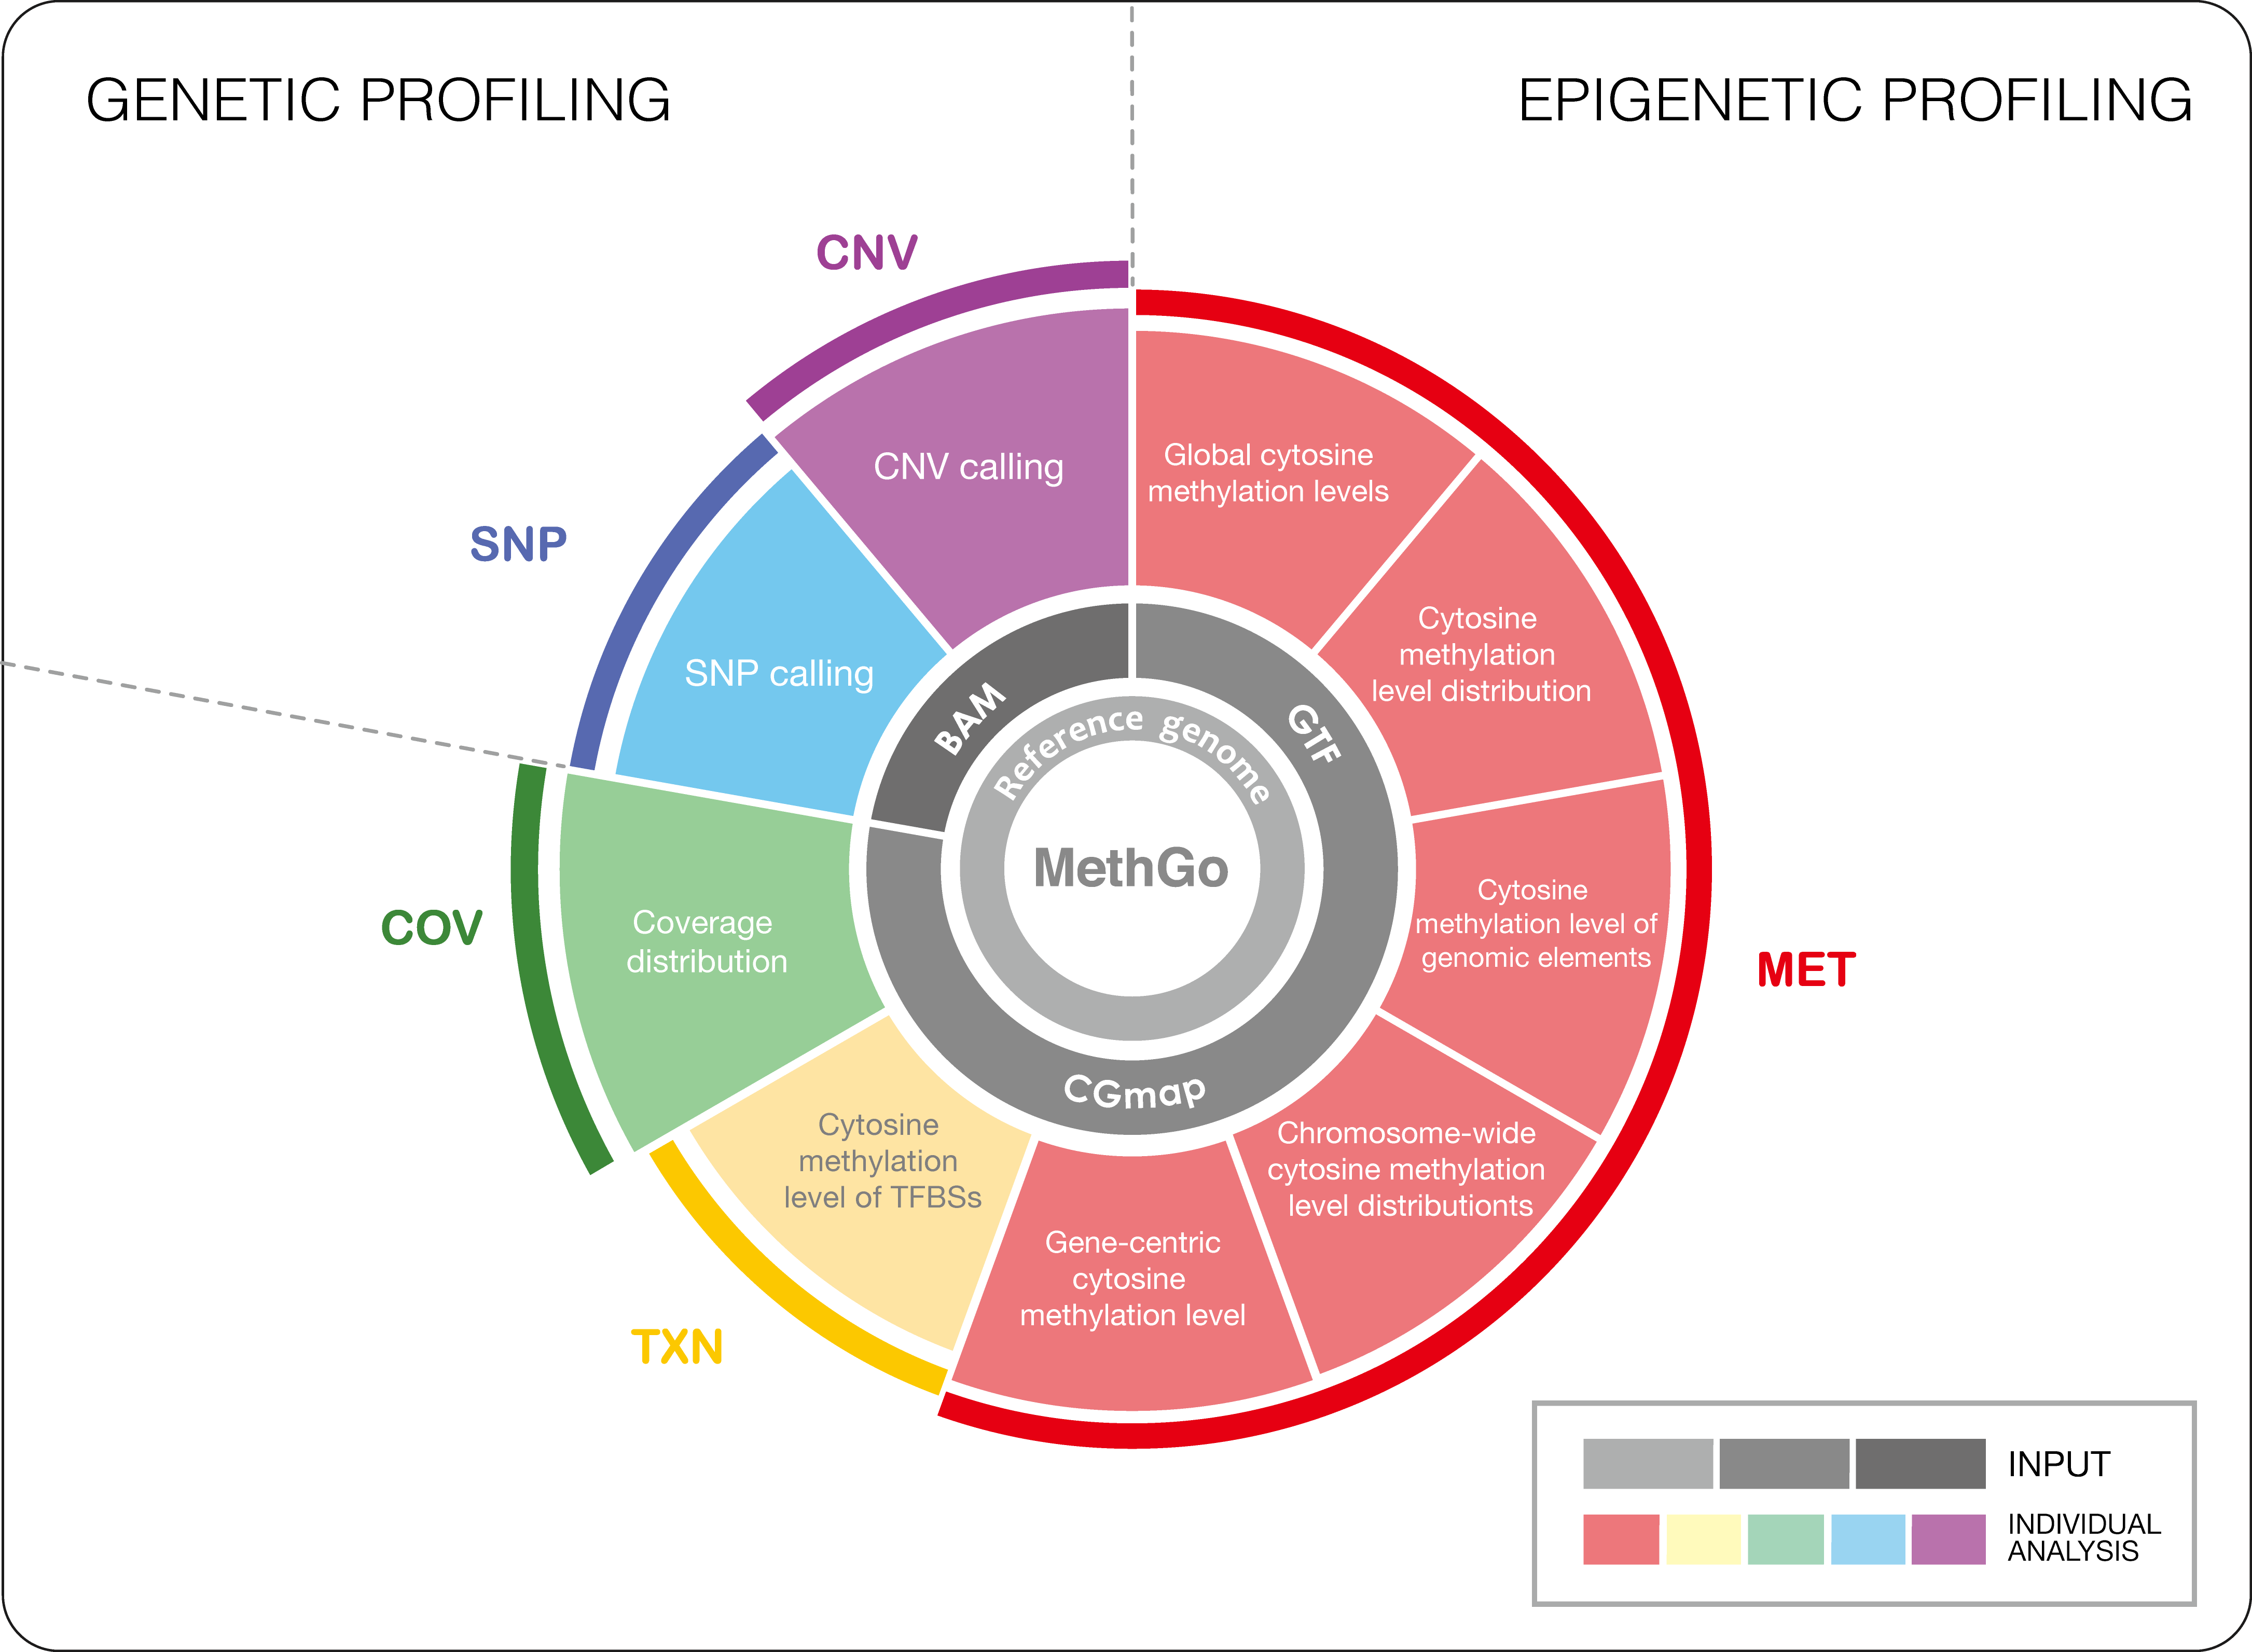 Overview of MethGo